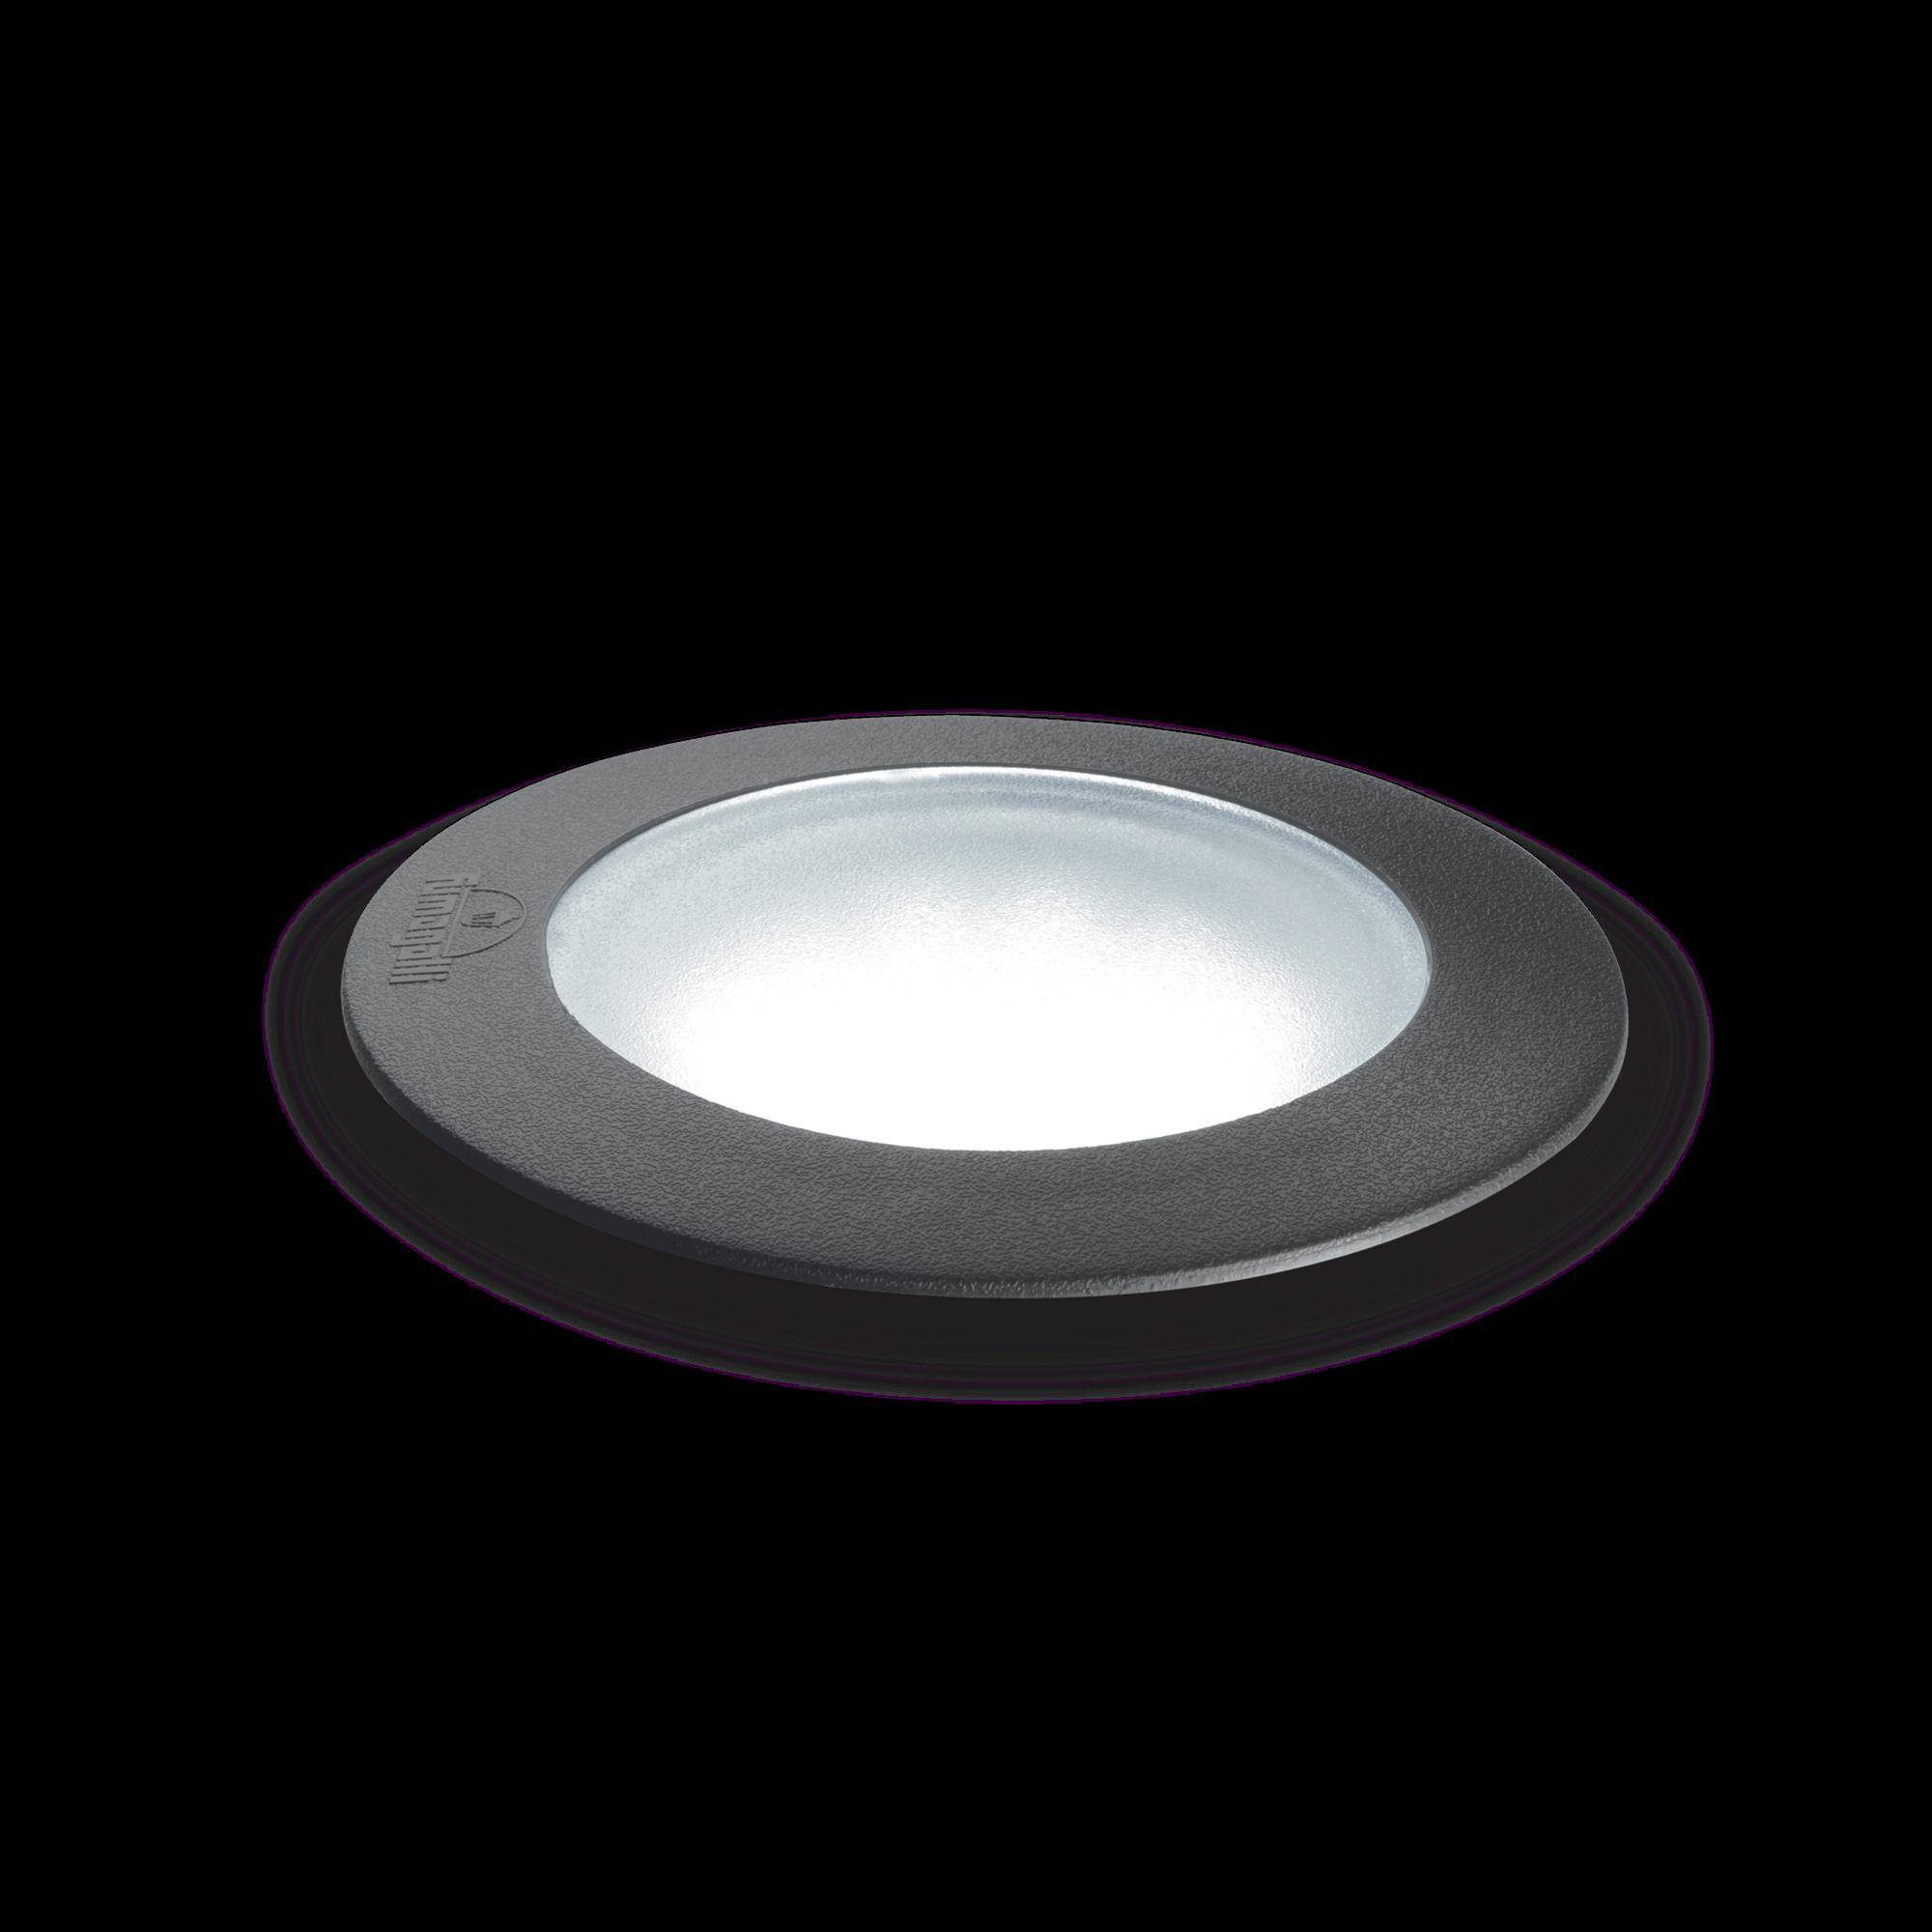 Exteriérové zápustné svítidlo Ideal lux 120324 CECI PT1 ROUND BIG 1xGX53 23W 4000K IP67